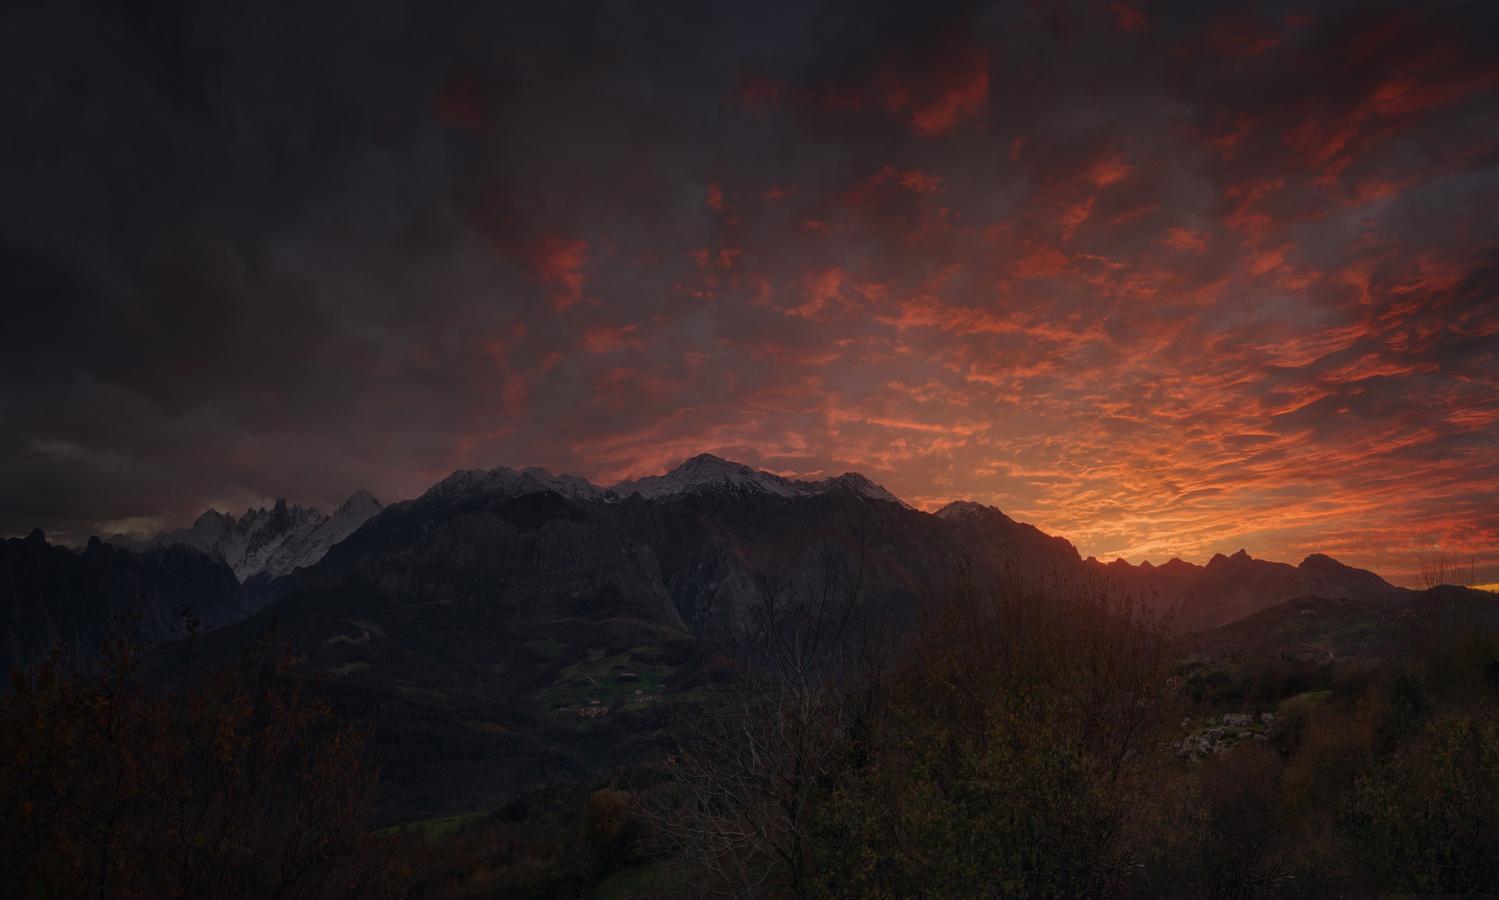 Sunset after the Picos de Europa by DaniGviews /Daniel